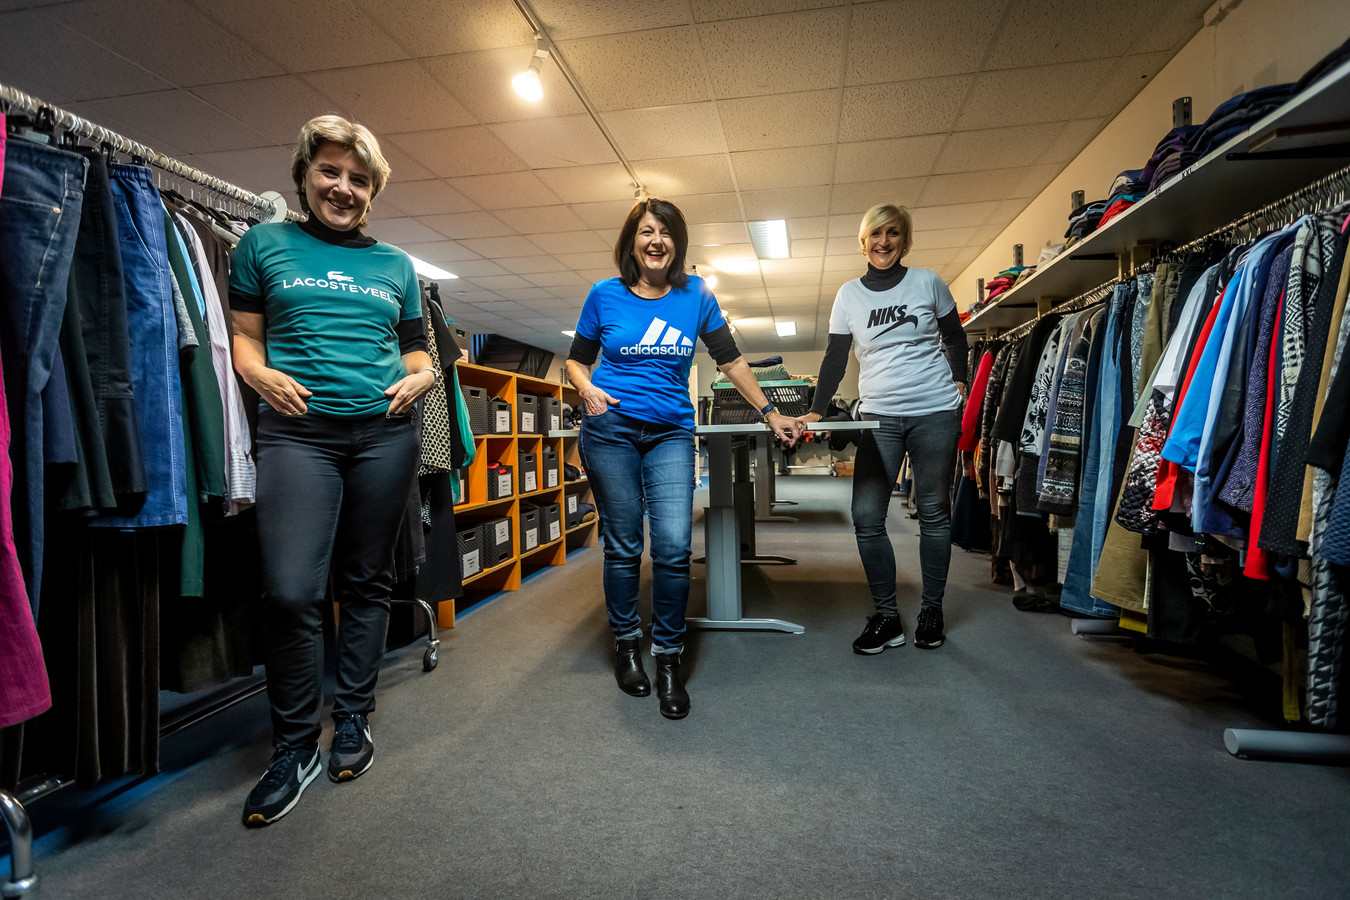 De Kledingbank in Eindhoven komt met een parodiërende kledinglijn van bekende merken. (Vlnr) Medewerksters Emily, Marja en Wendy.